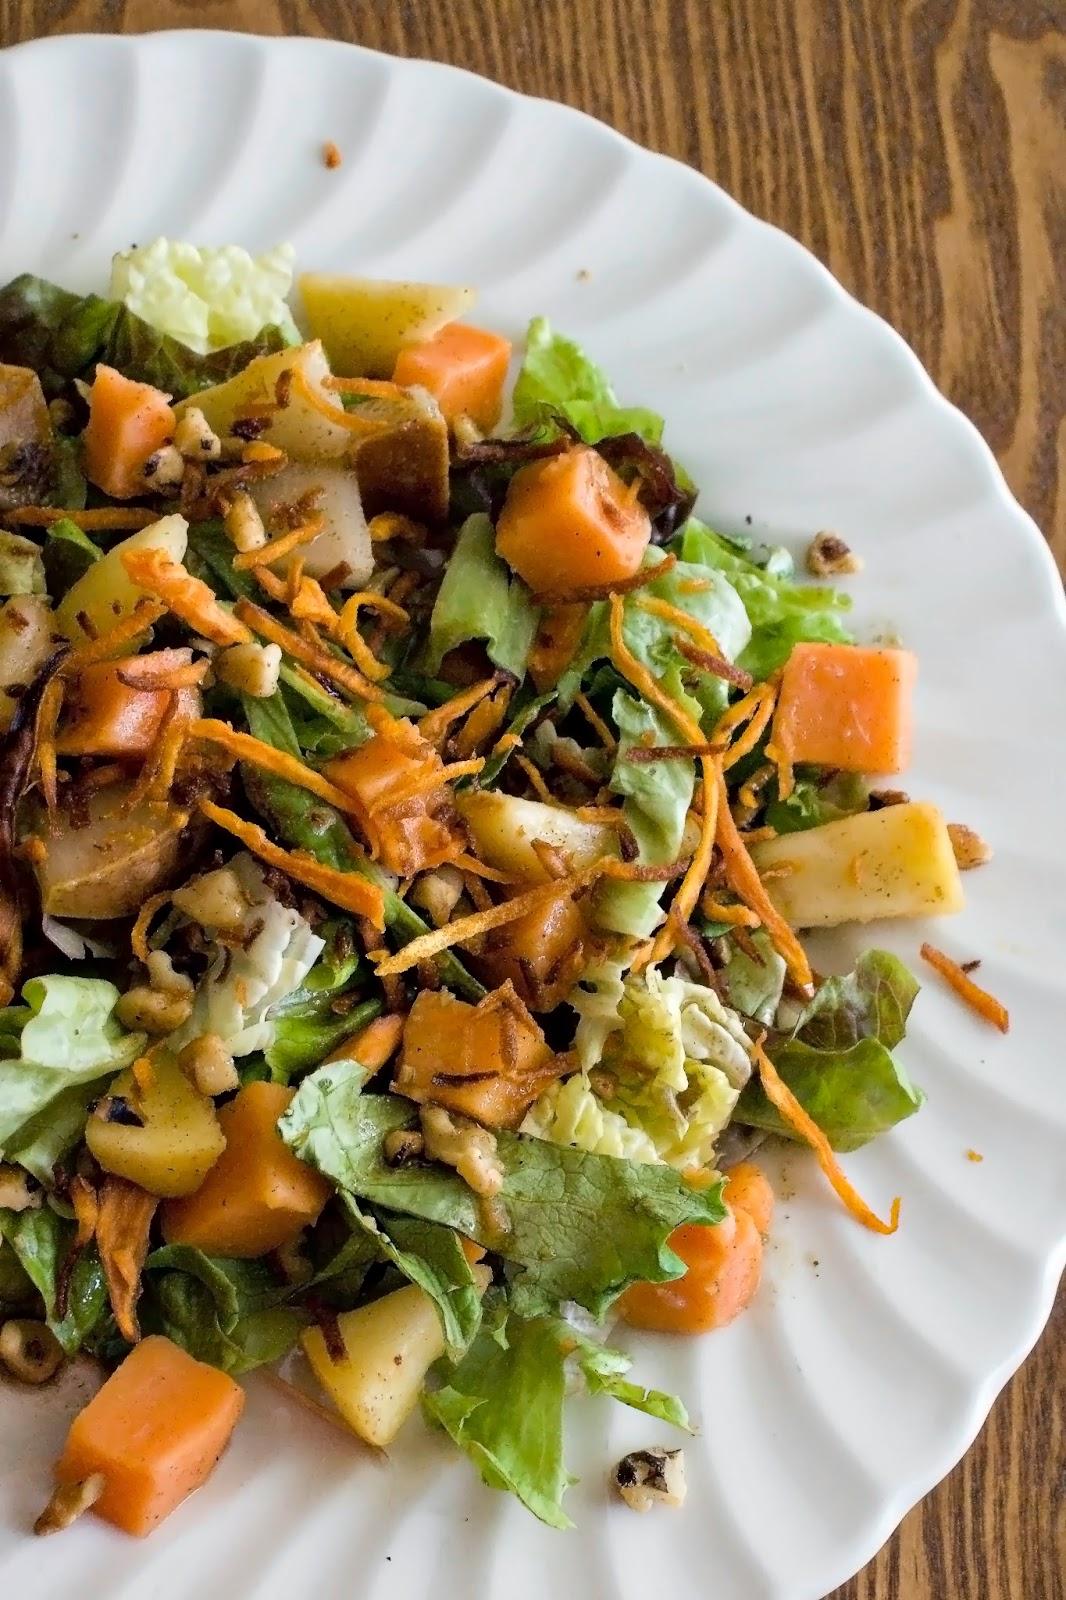 Sweet Potato-Pear Salad with Walnuts and Potato Crisps